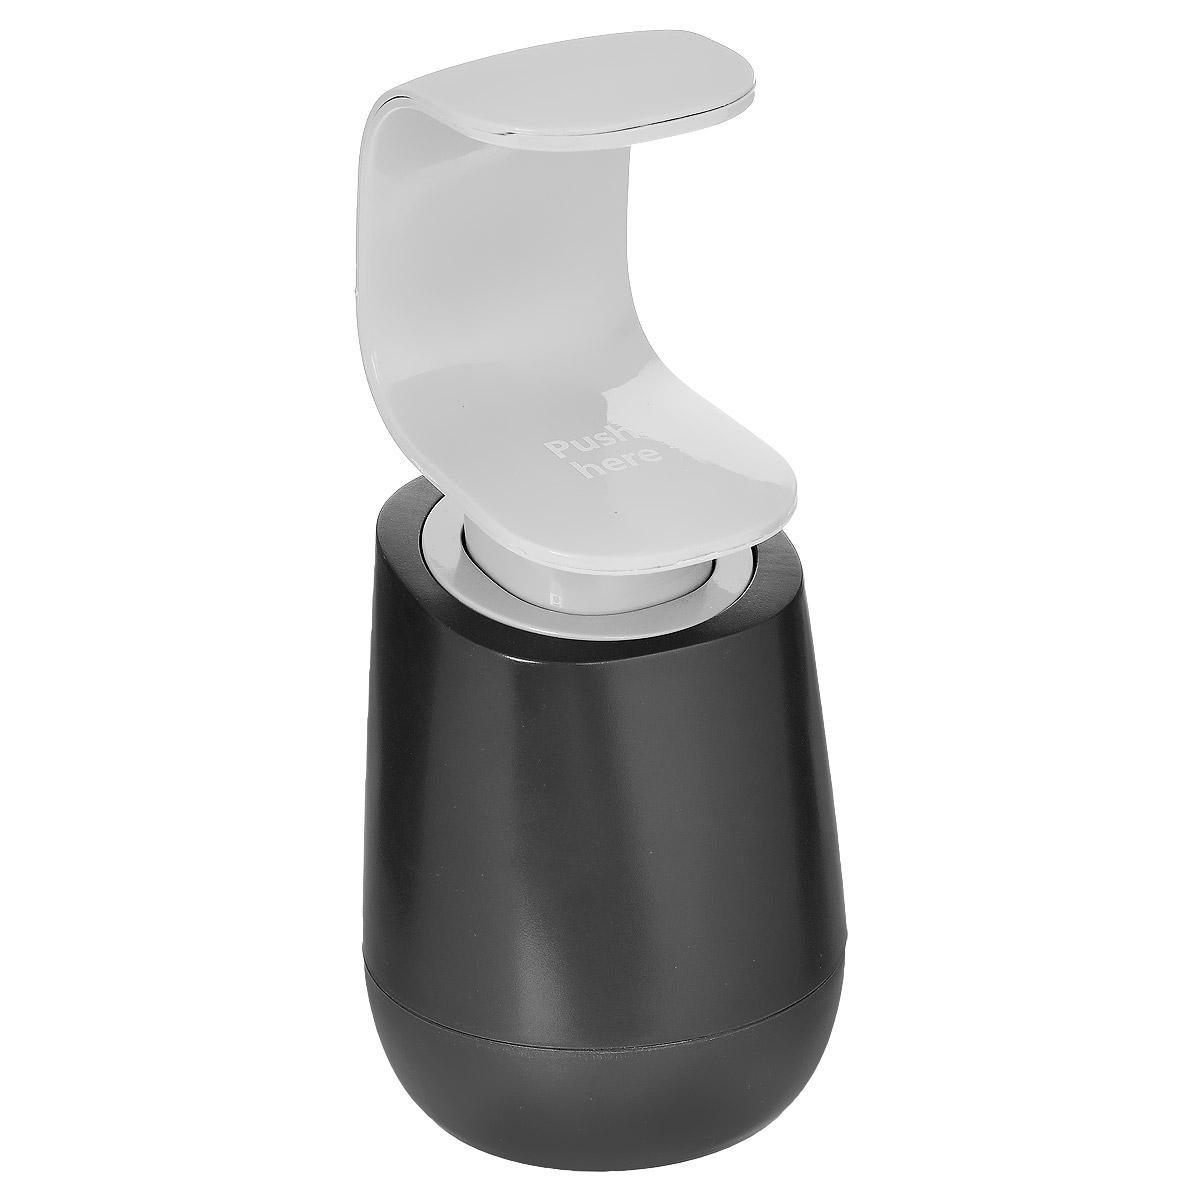 Диспенсер для мыла Joseph Joseph C-Pump, цвет: серый, 300 мл85054